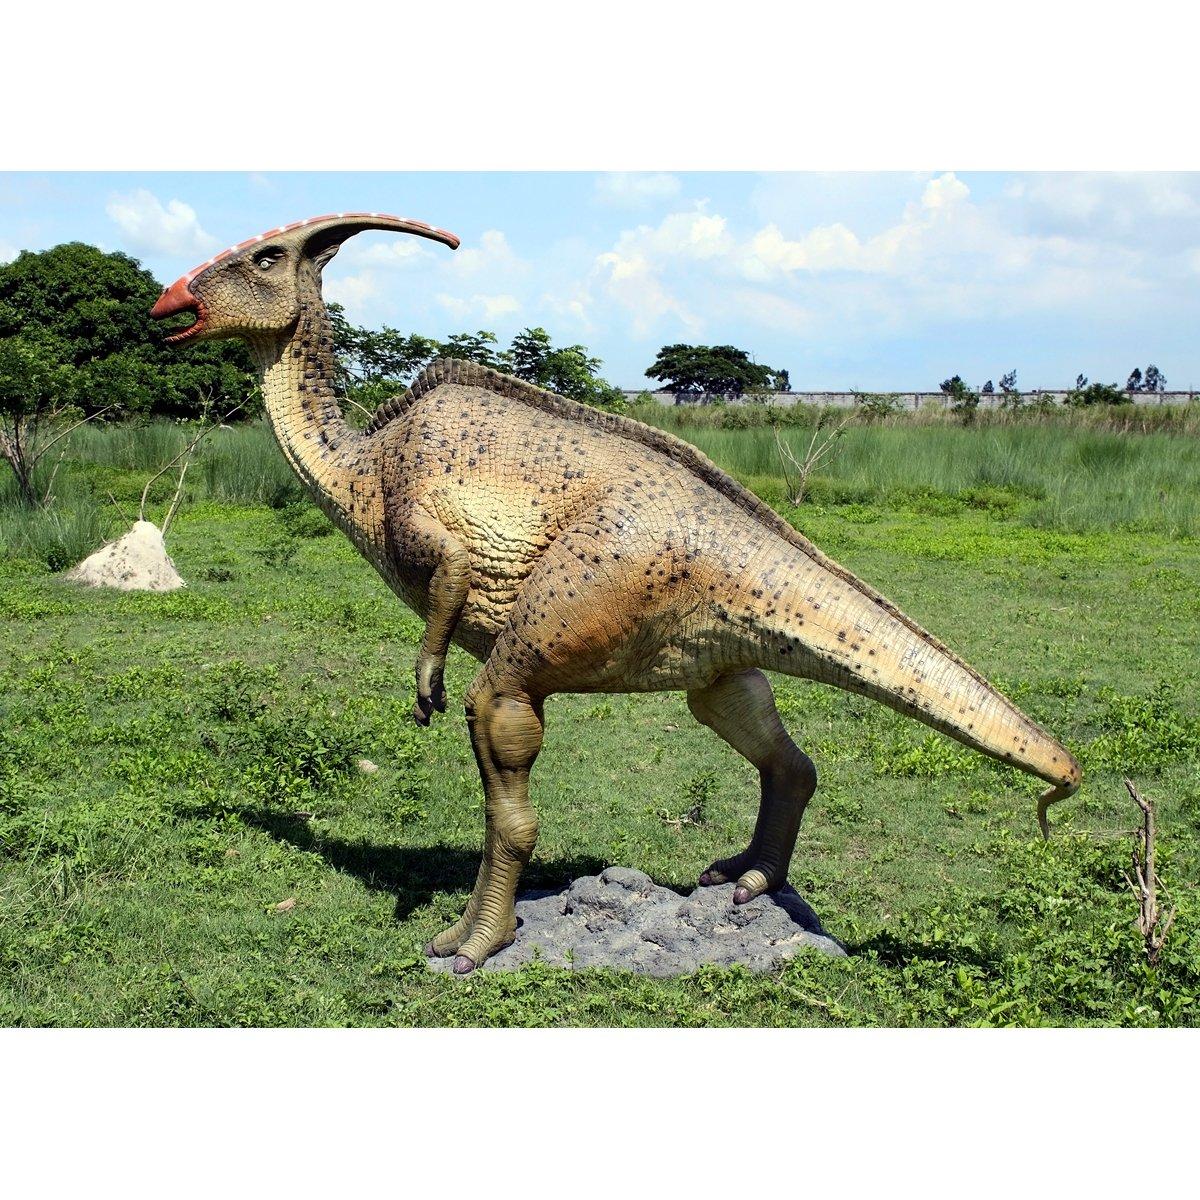 Amazoncom Design Toscano Parasaurolopus Dinosaur Statue